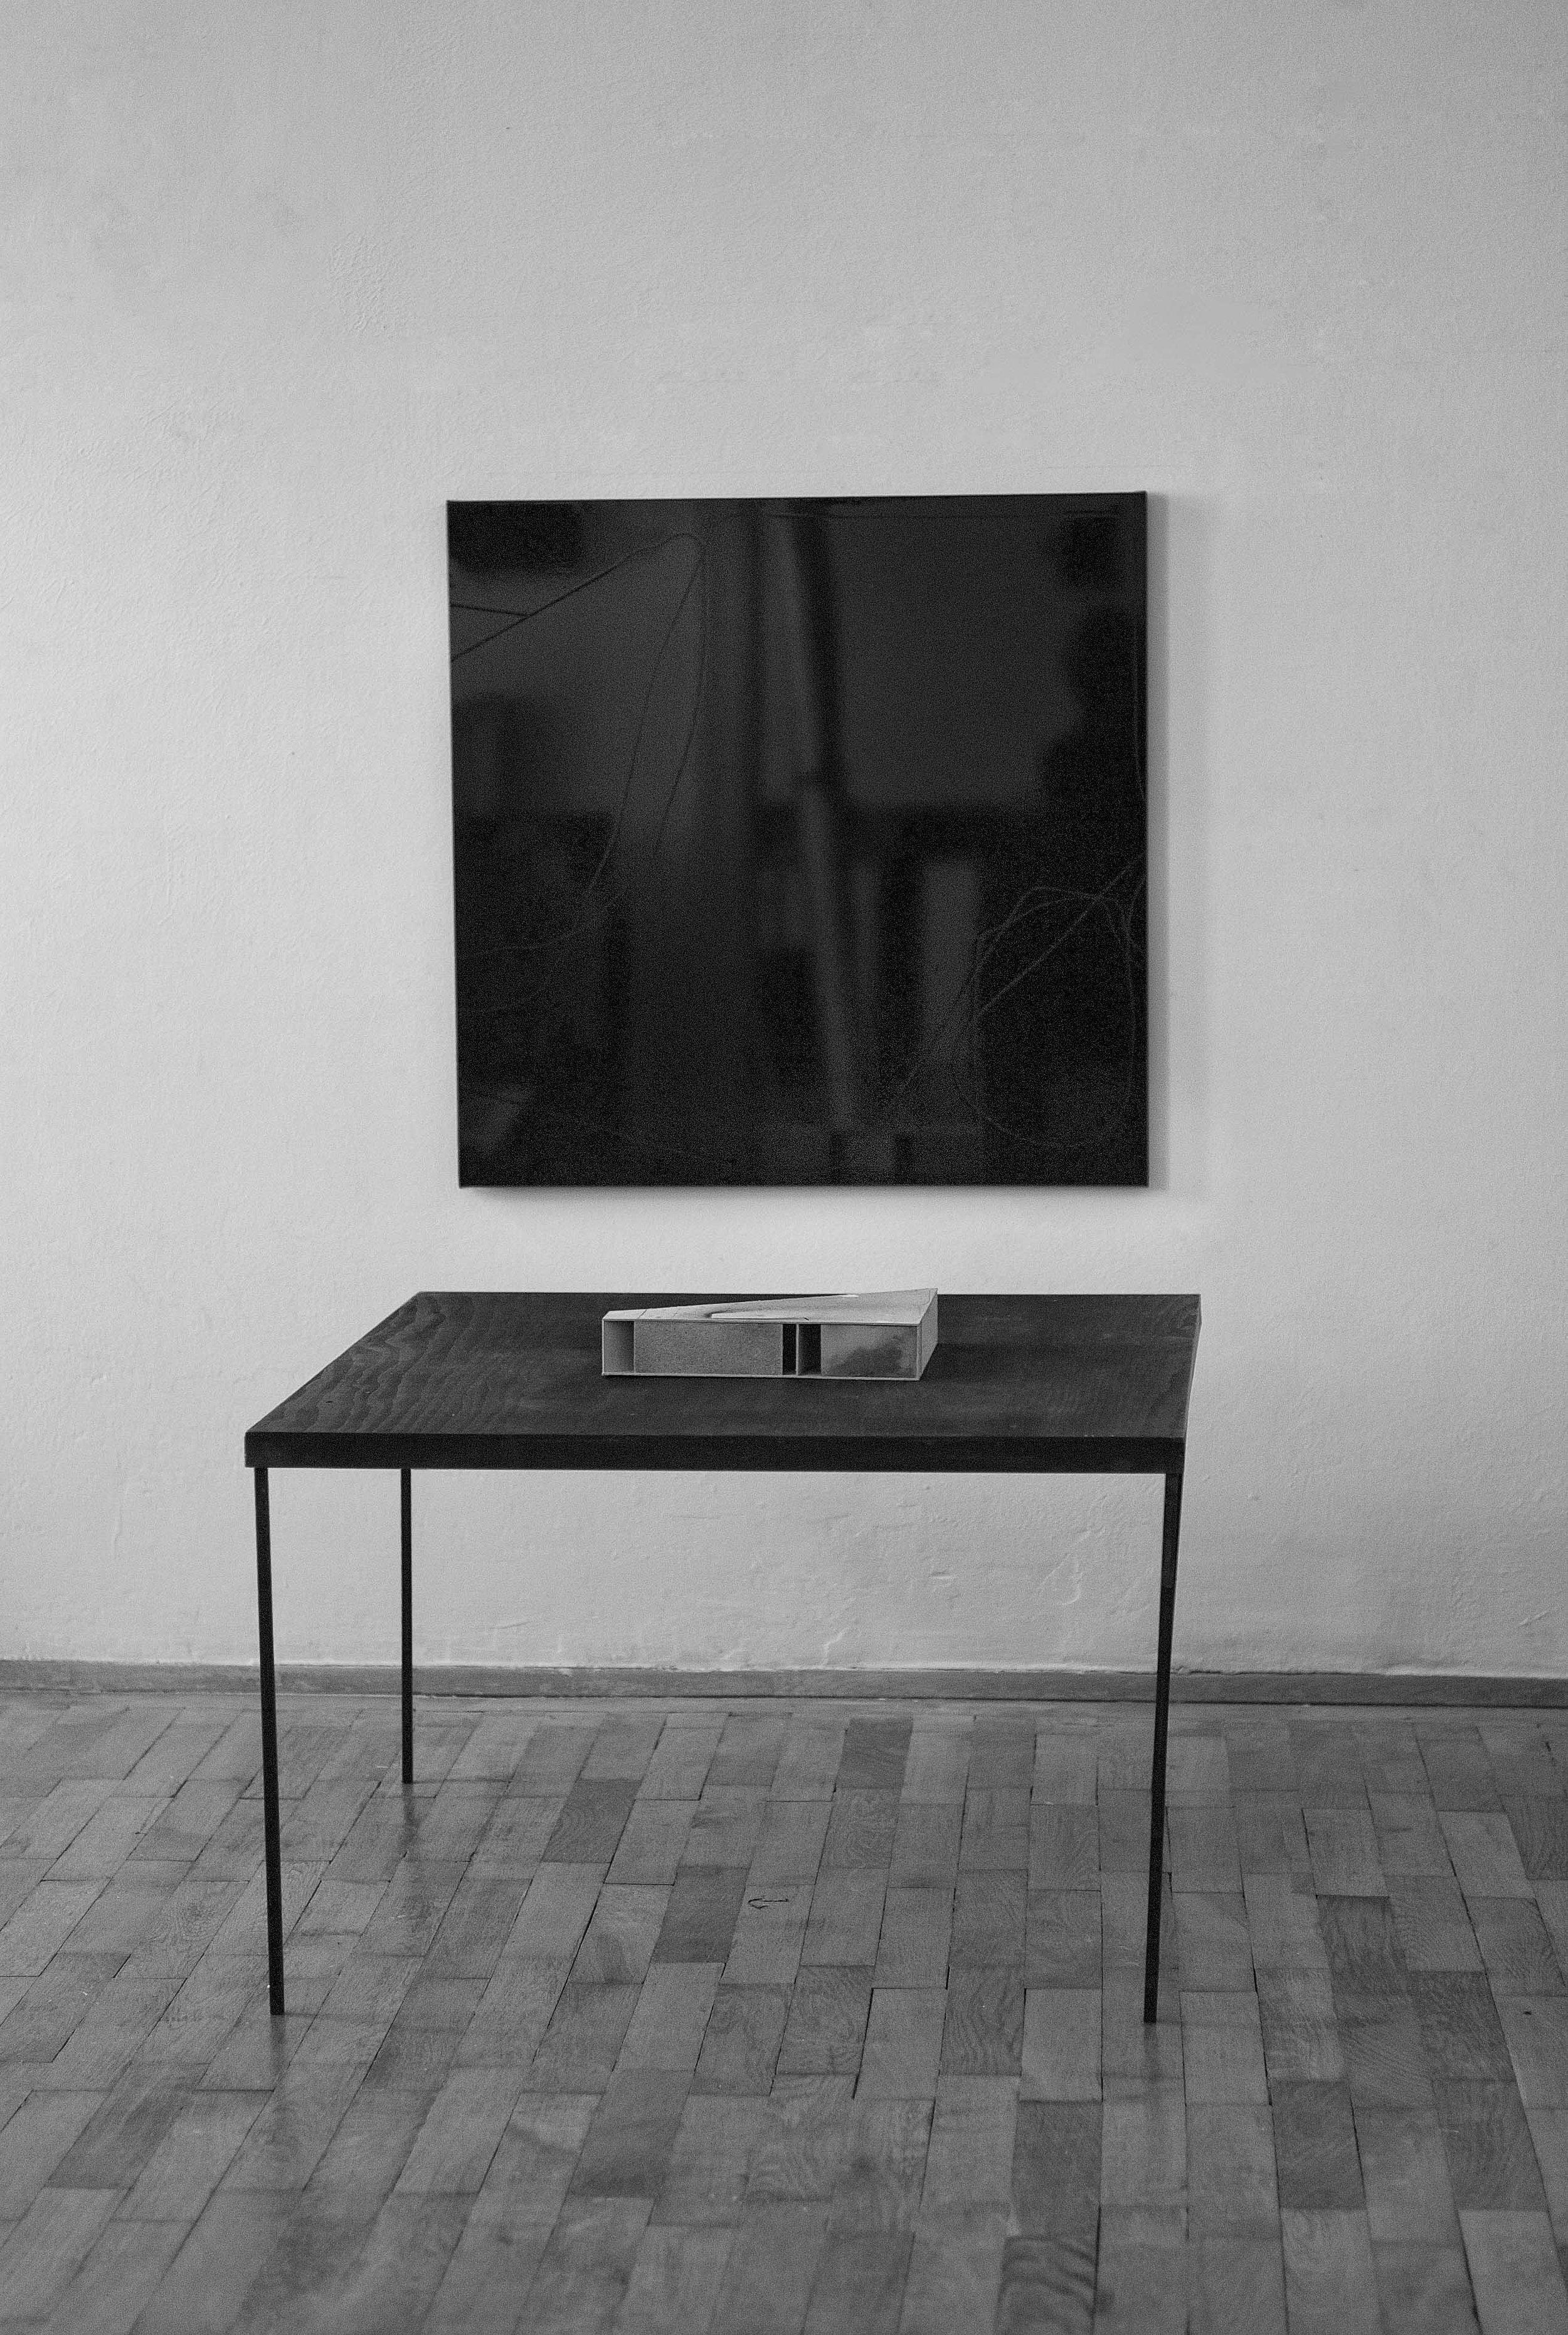 untitled, 100 x 102 cm,  vinyl on pvc, 2015, casette plywood oilcoloured, on casette: model, cardboard, Crayon Derwent, Ponal,